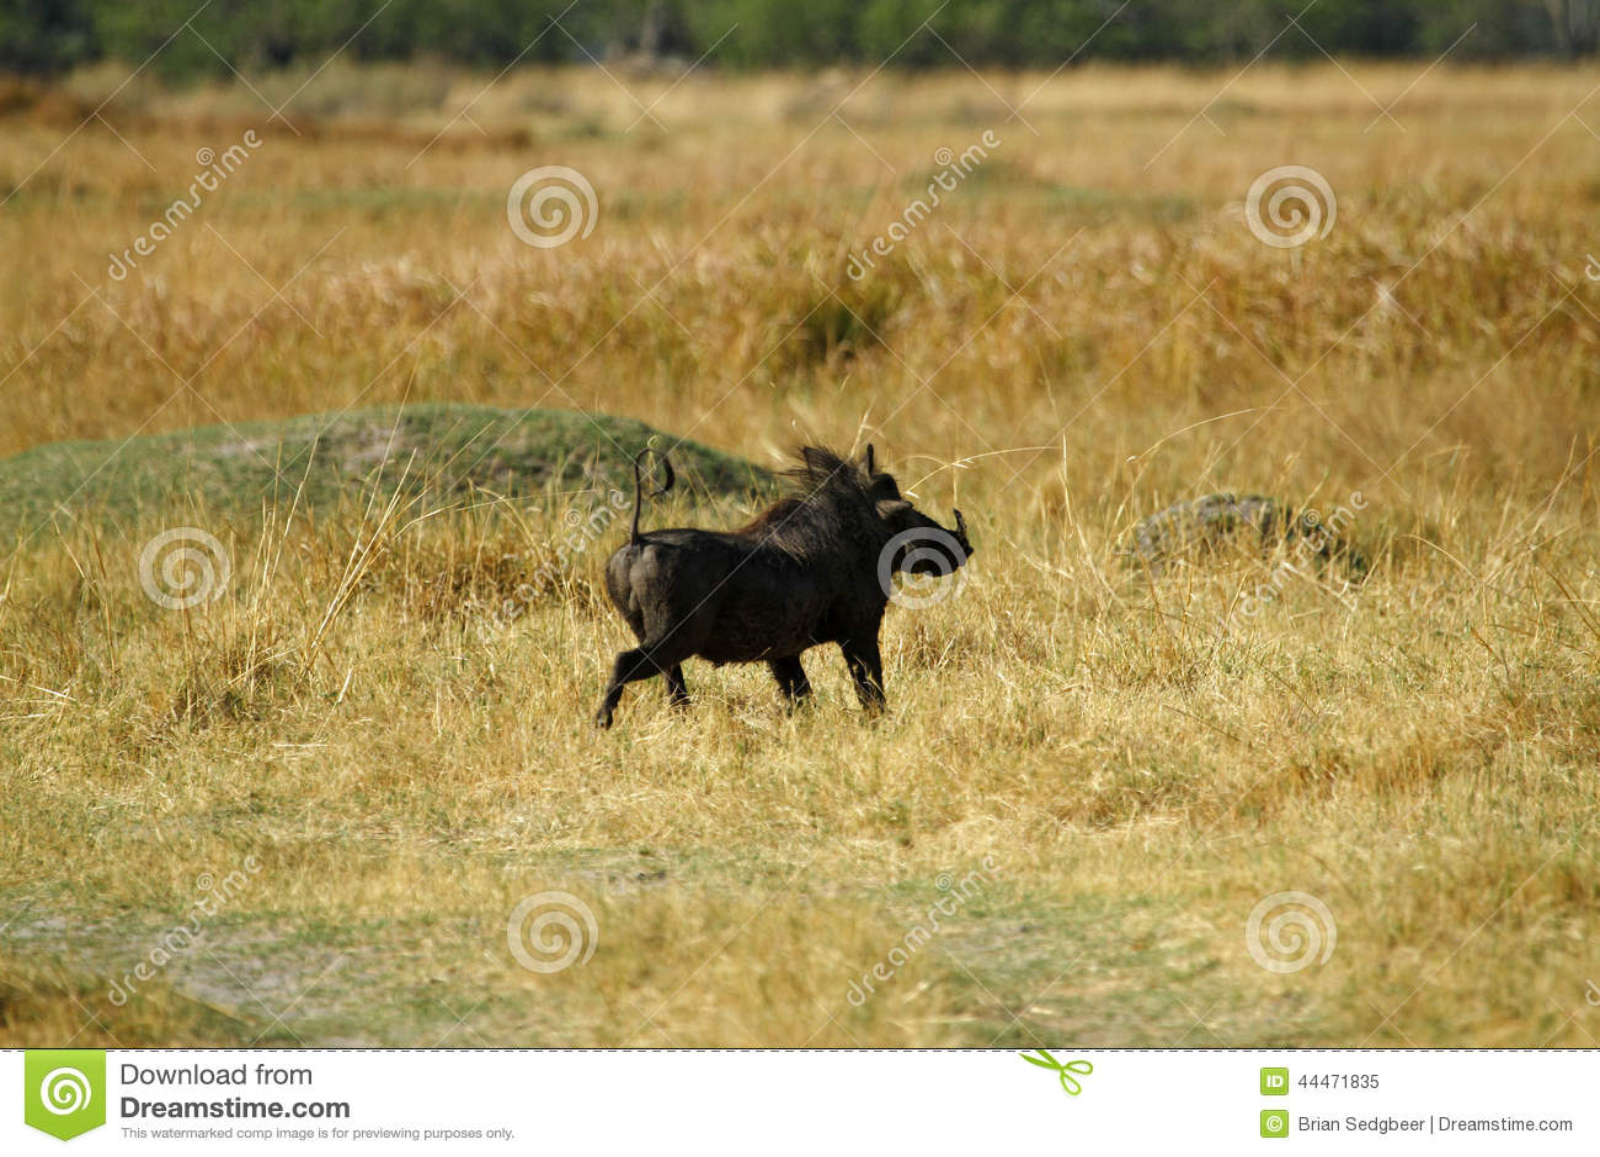 Wart Hog Safari Delight